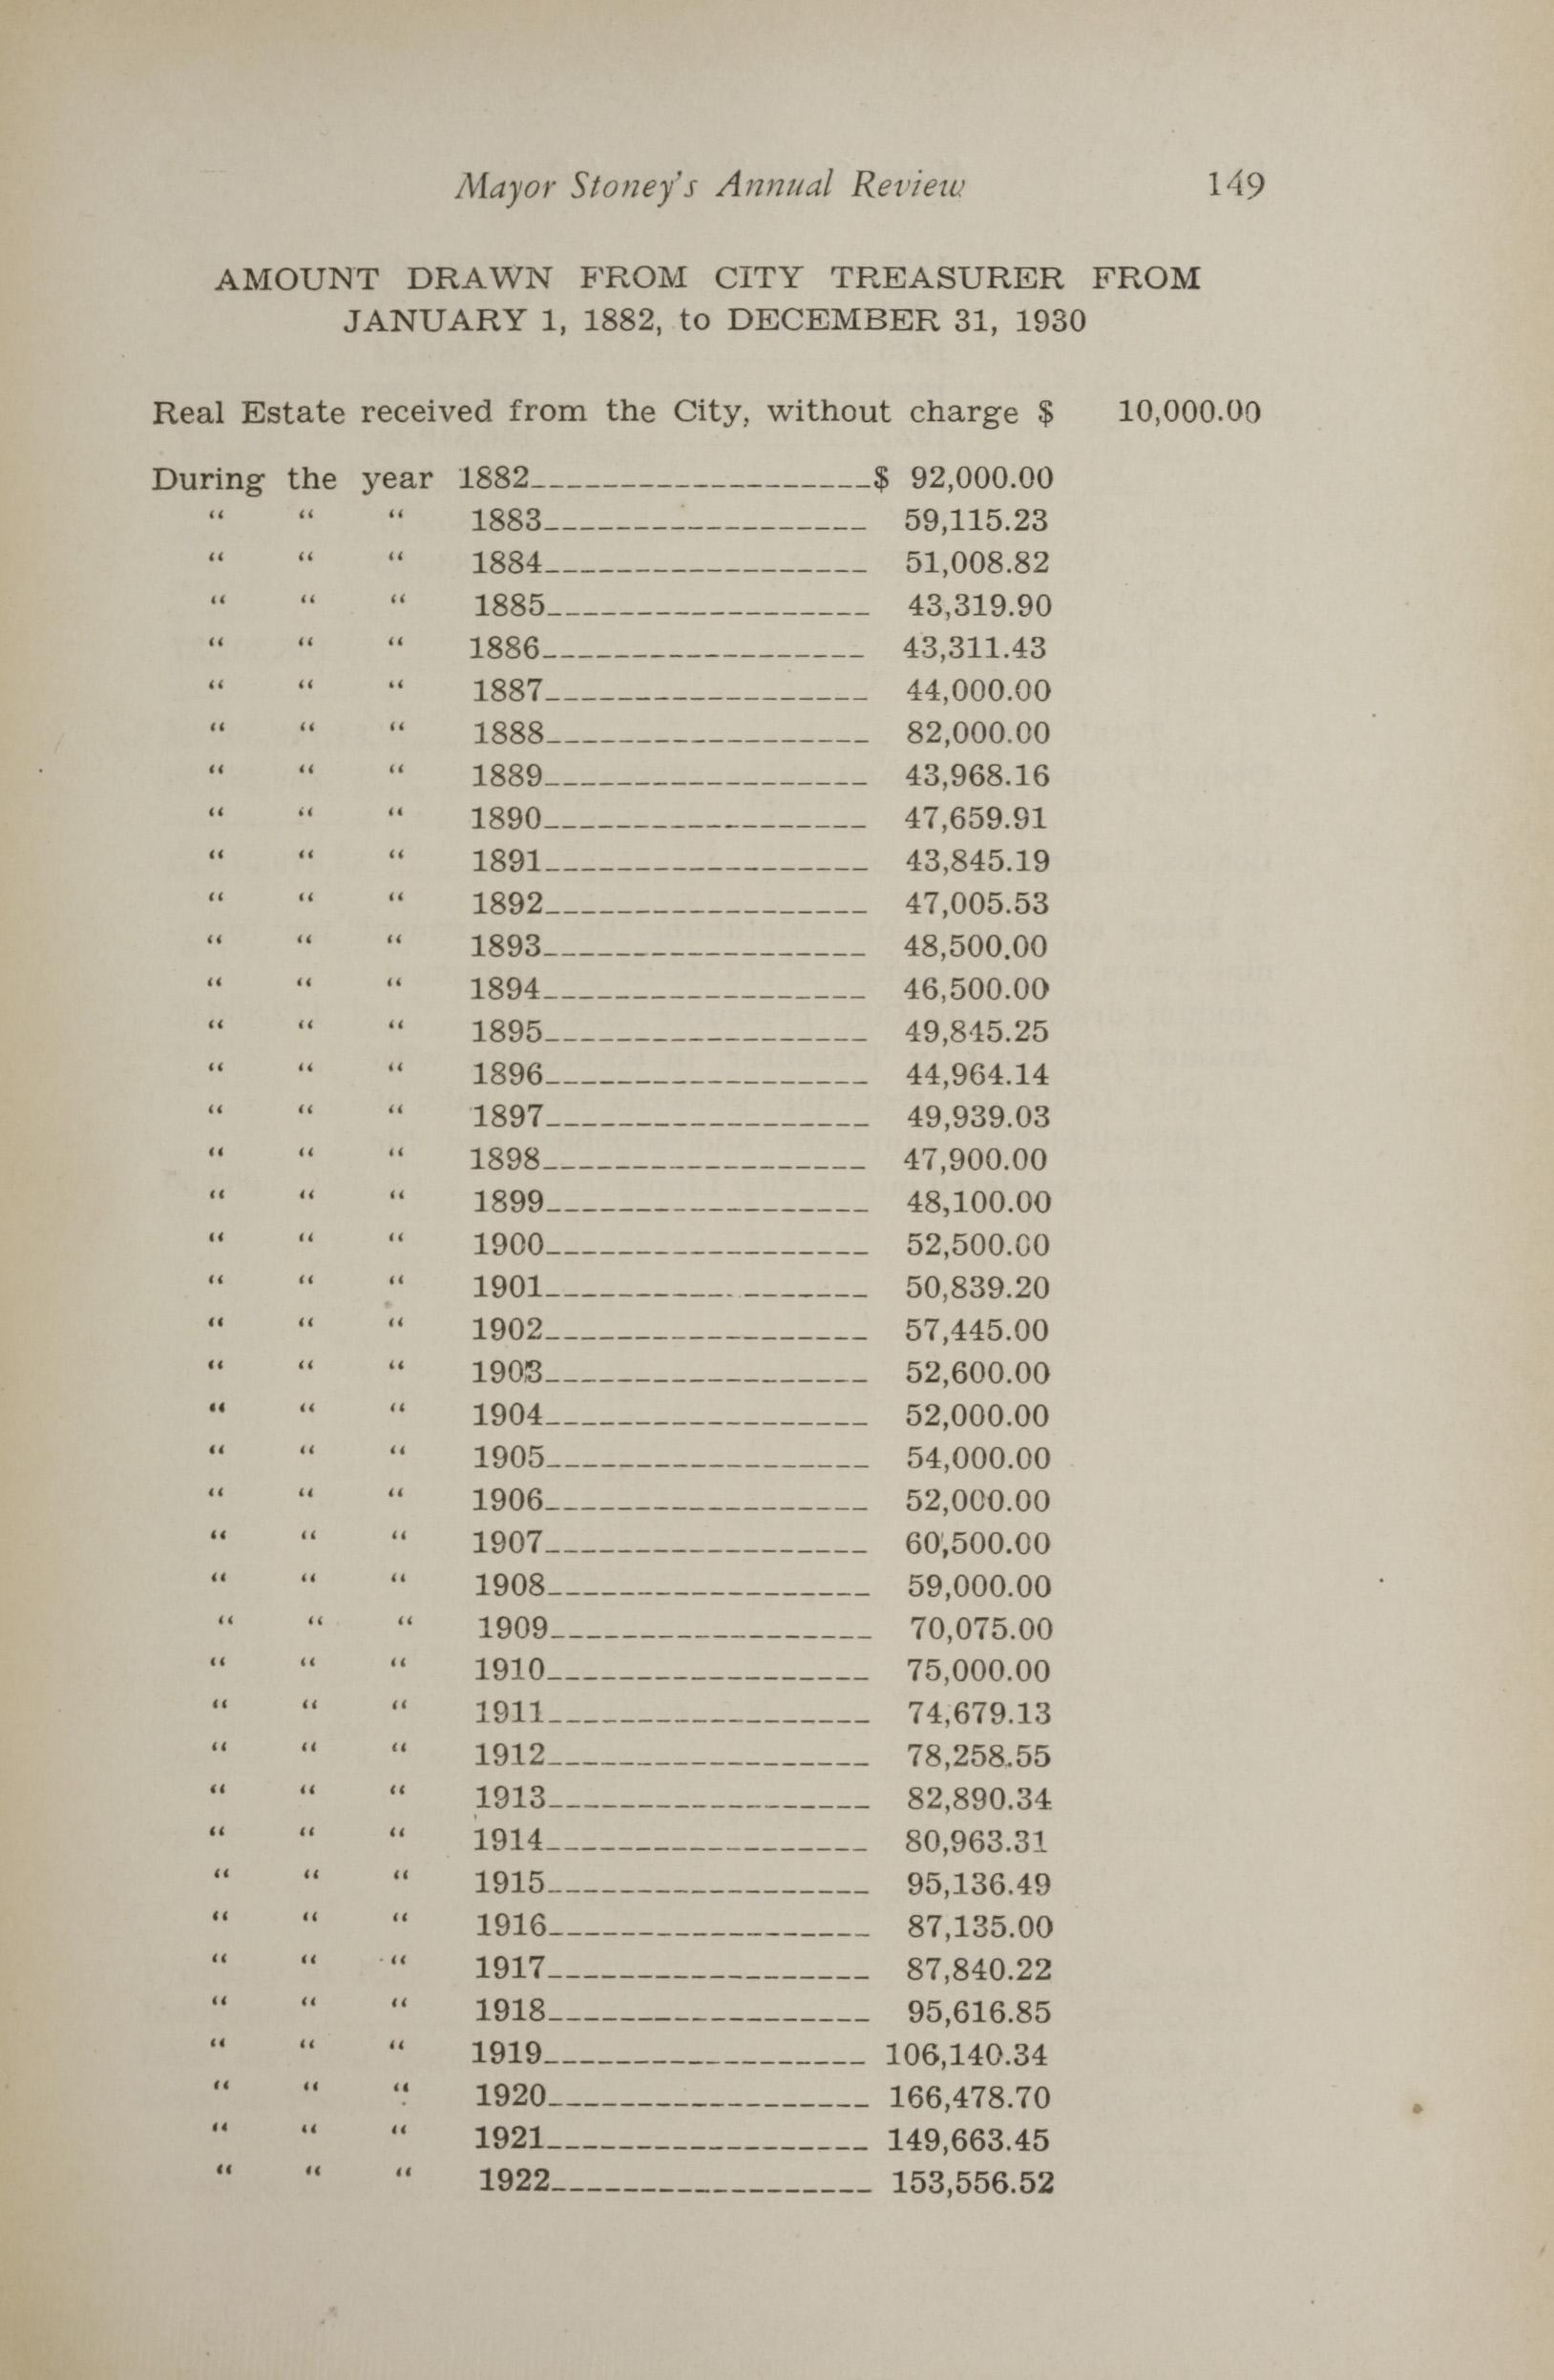 Charleston Yearbook, 1930, page 149